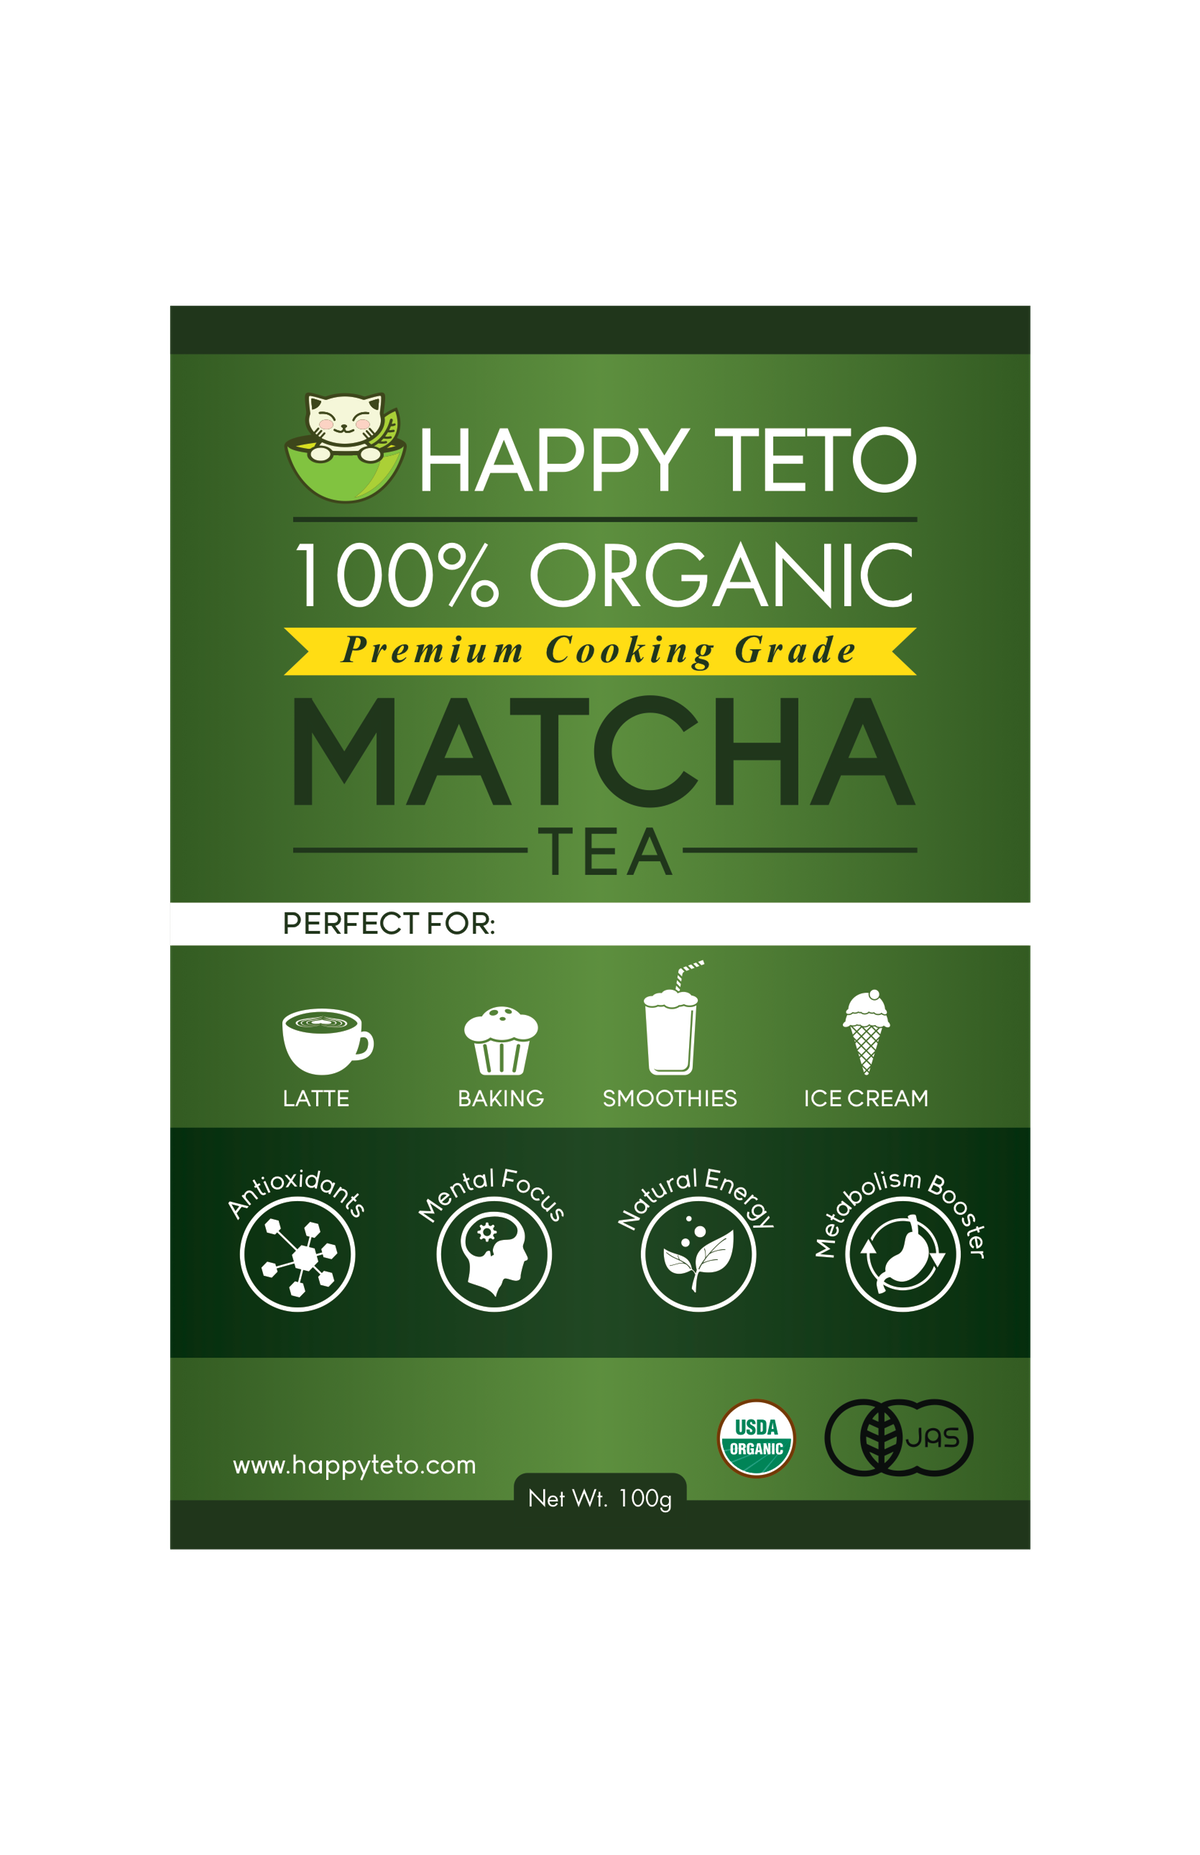 Follow-up on matcha branding